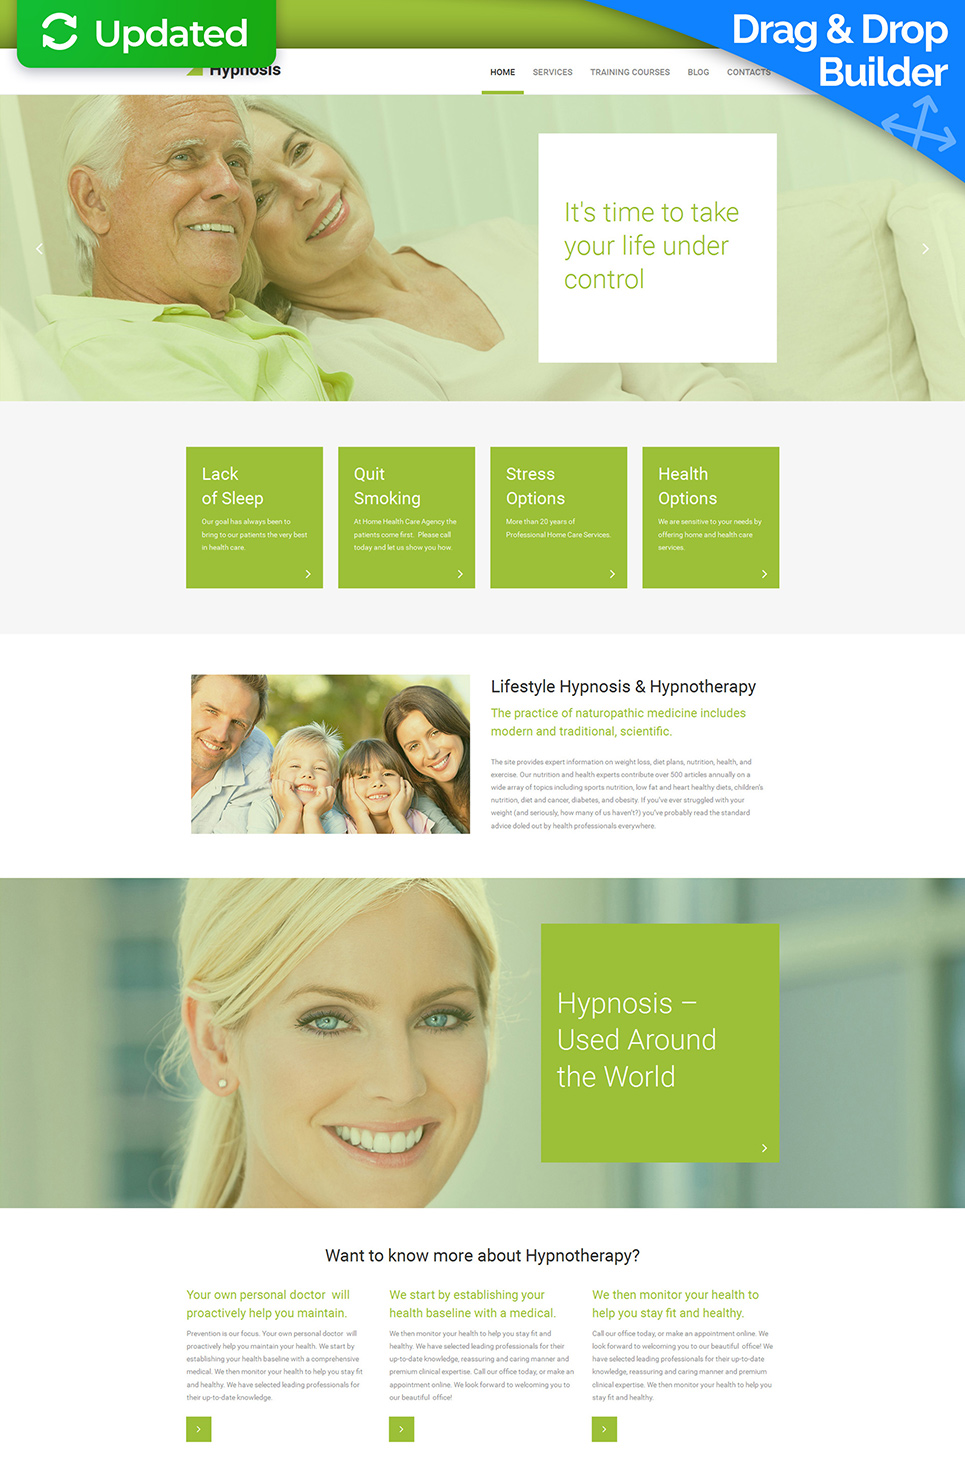 Pre-made web design for medical advisers